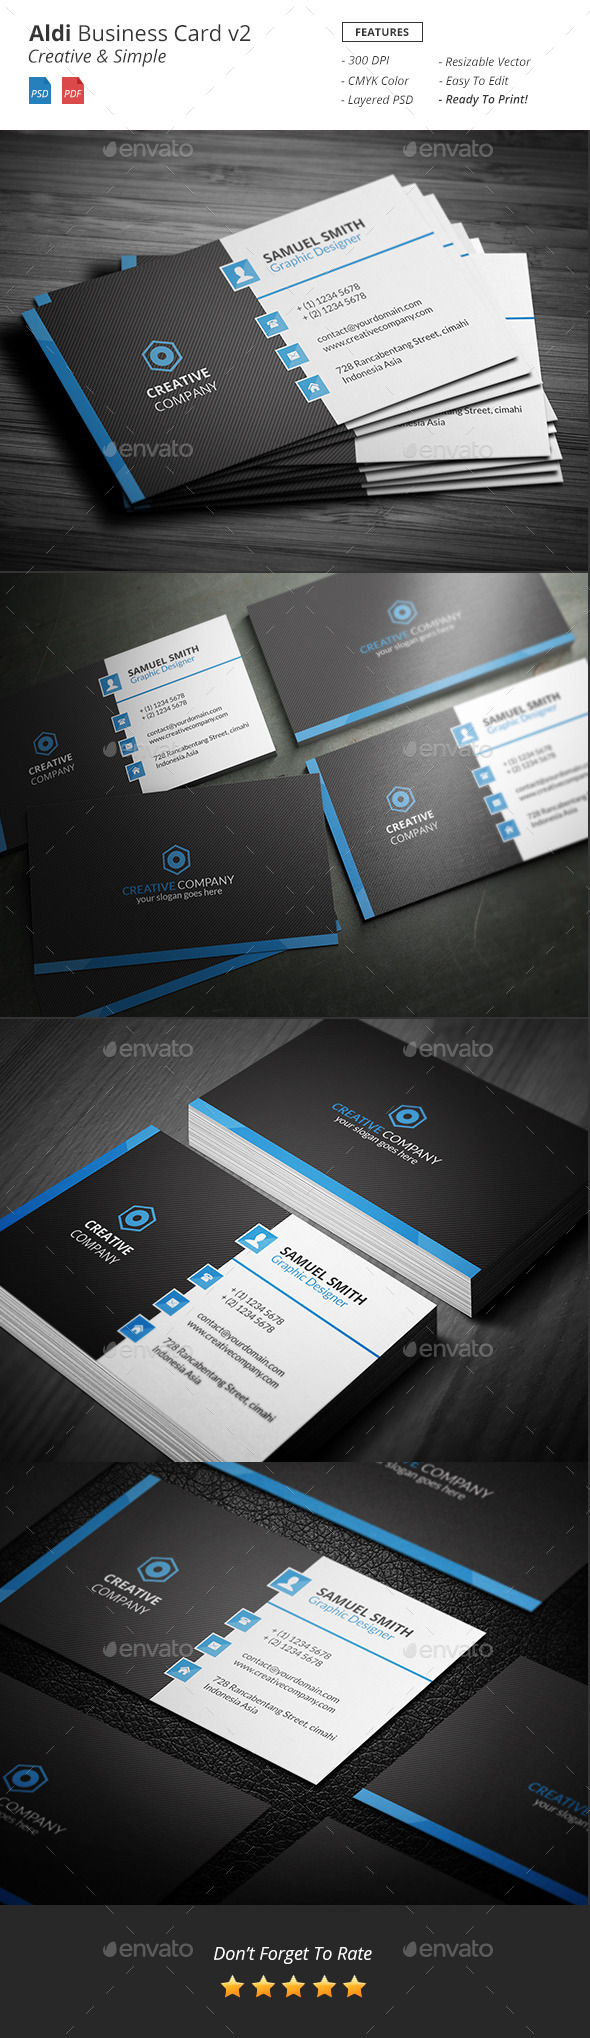 Aldi - Creative Business Card v2 - Creative Business Cards